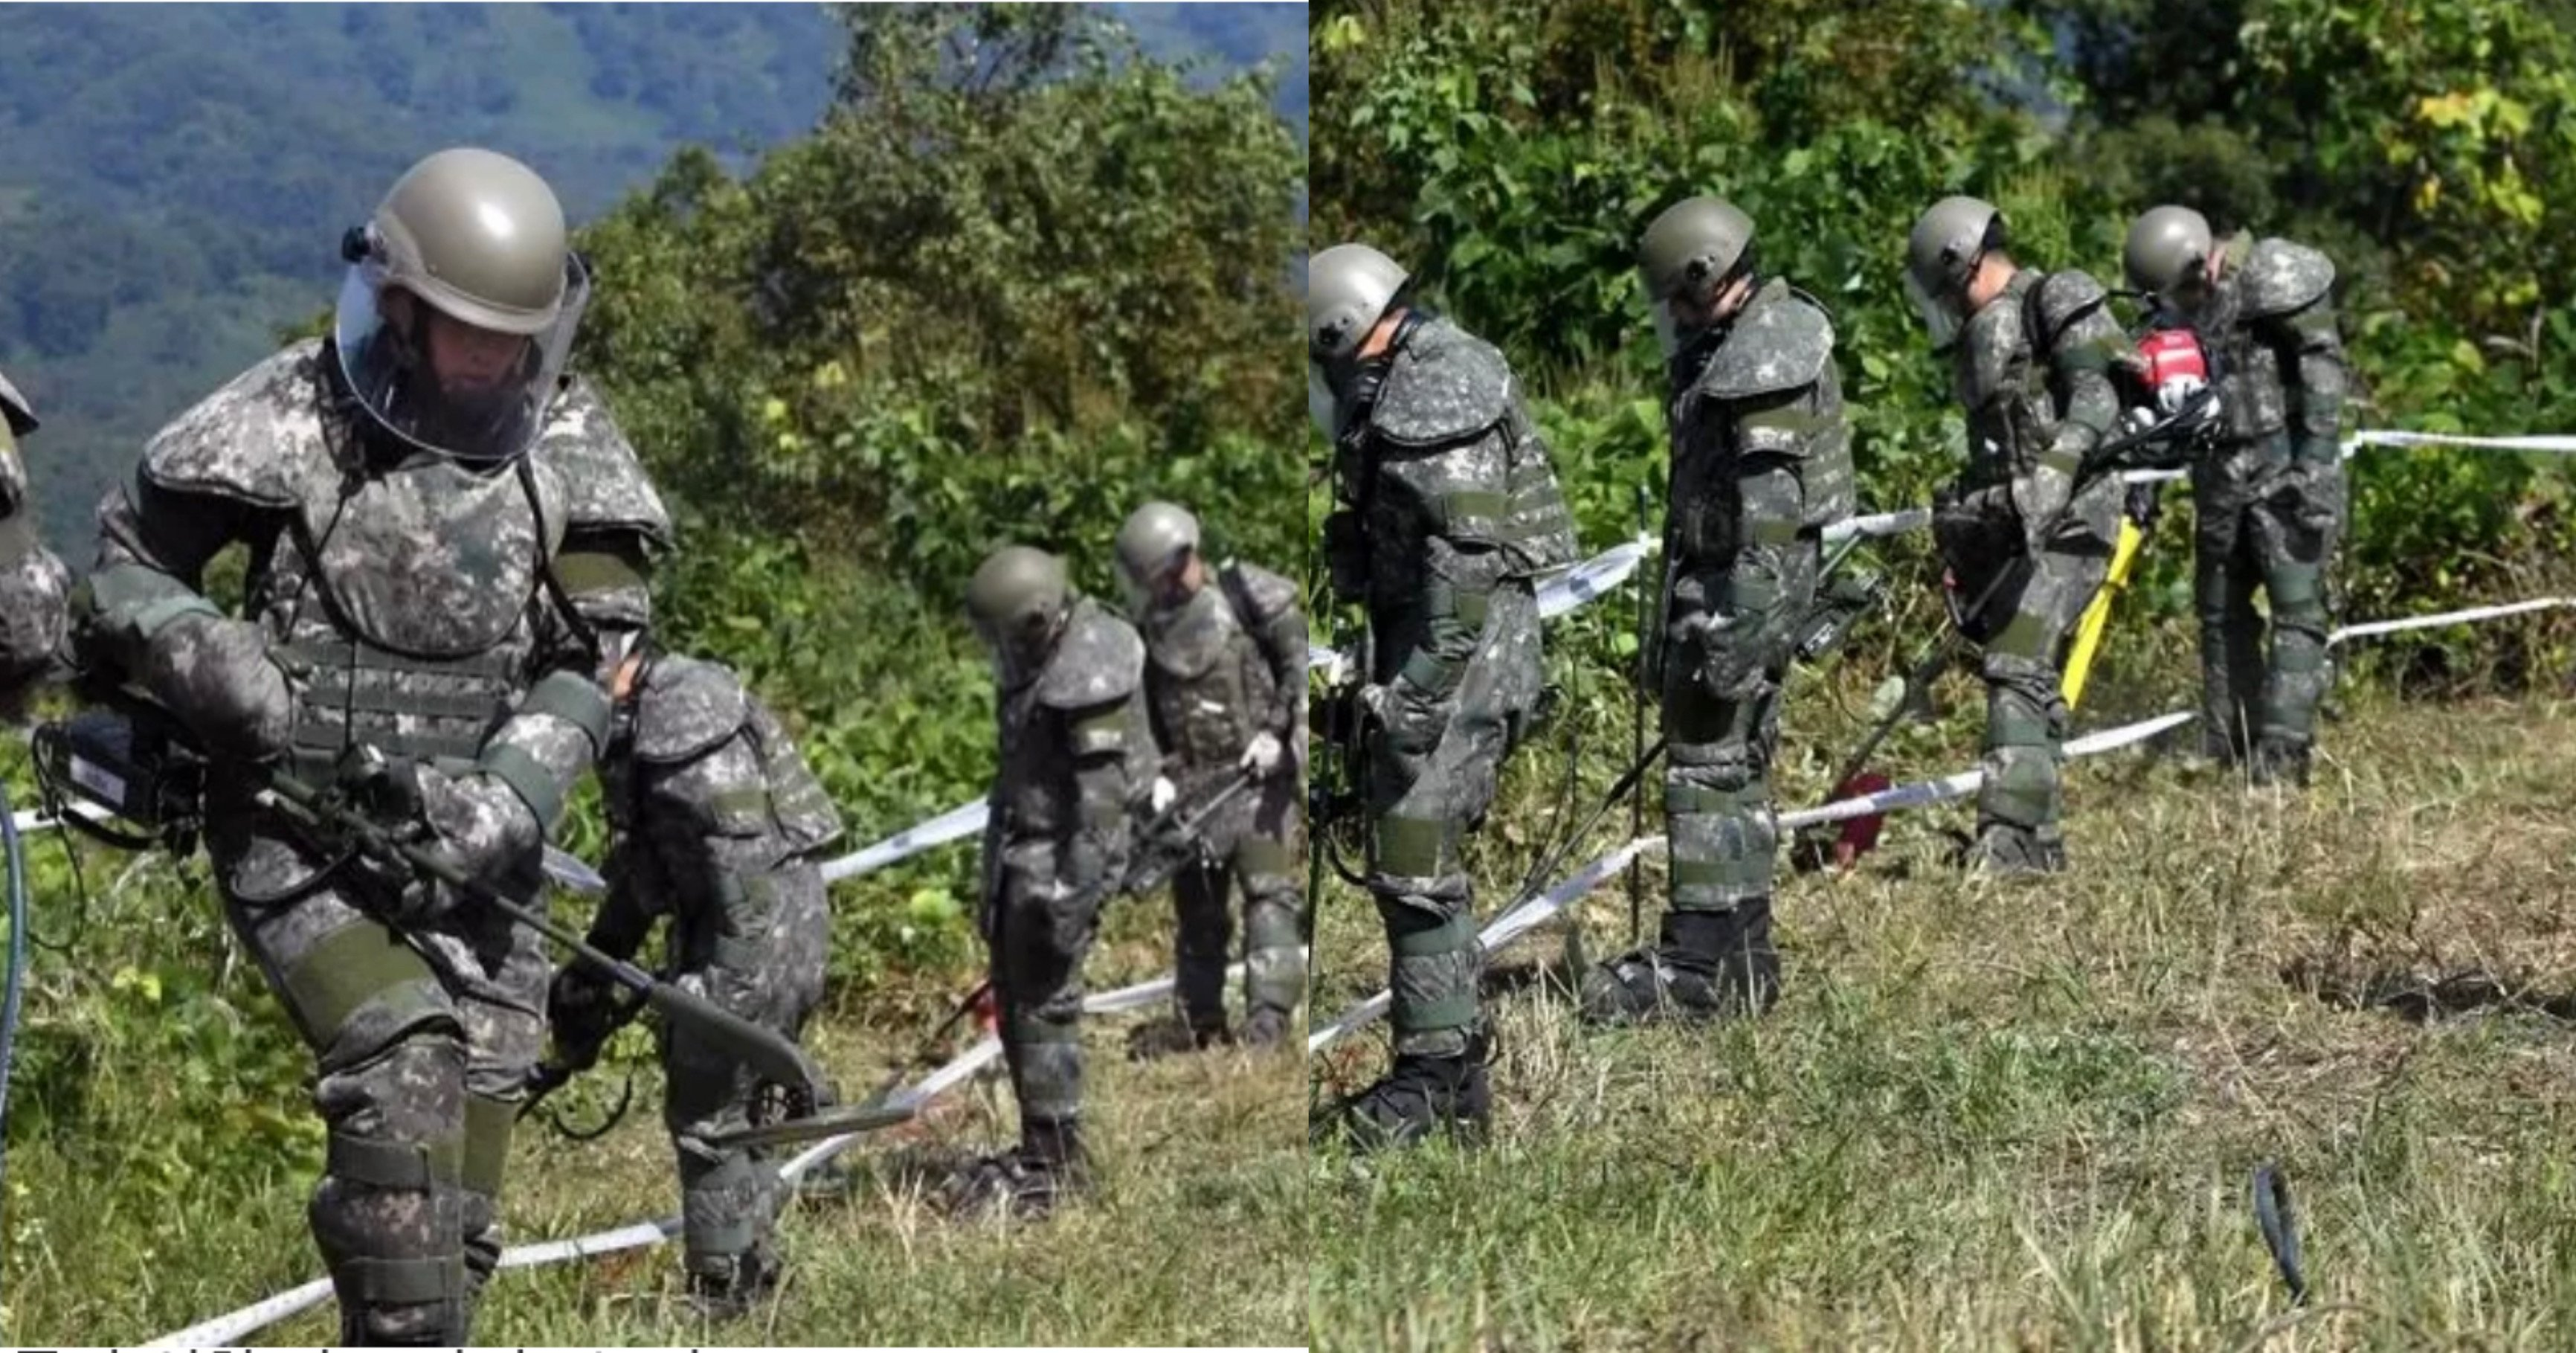 "5ad56749 4be4 4eb7 a142 384e44d5dfab.jpeg?resize=412,232 - ""이 더운날에..""북한이 묻어 놓은 지뢰 수색하는 군인들이 '폭염주의보' 속에도 입어야 하는 방호복 수준(+사진)"